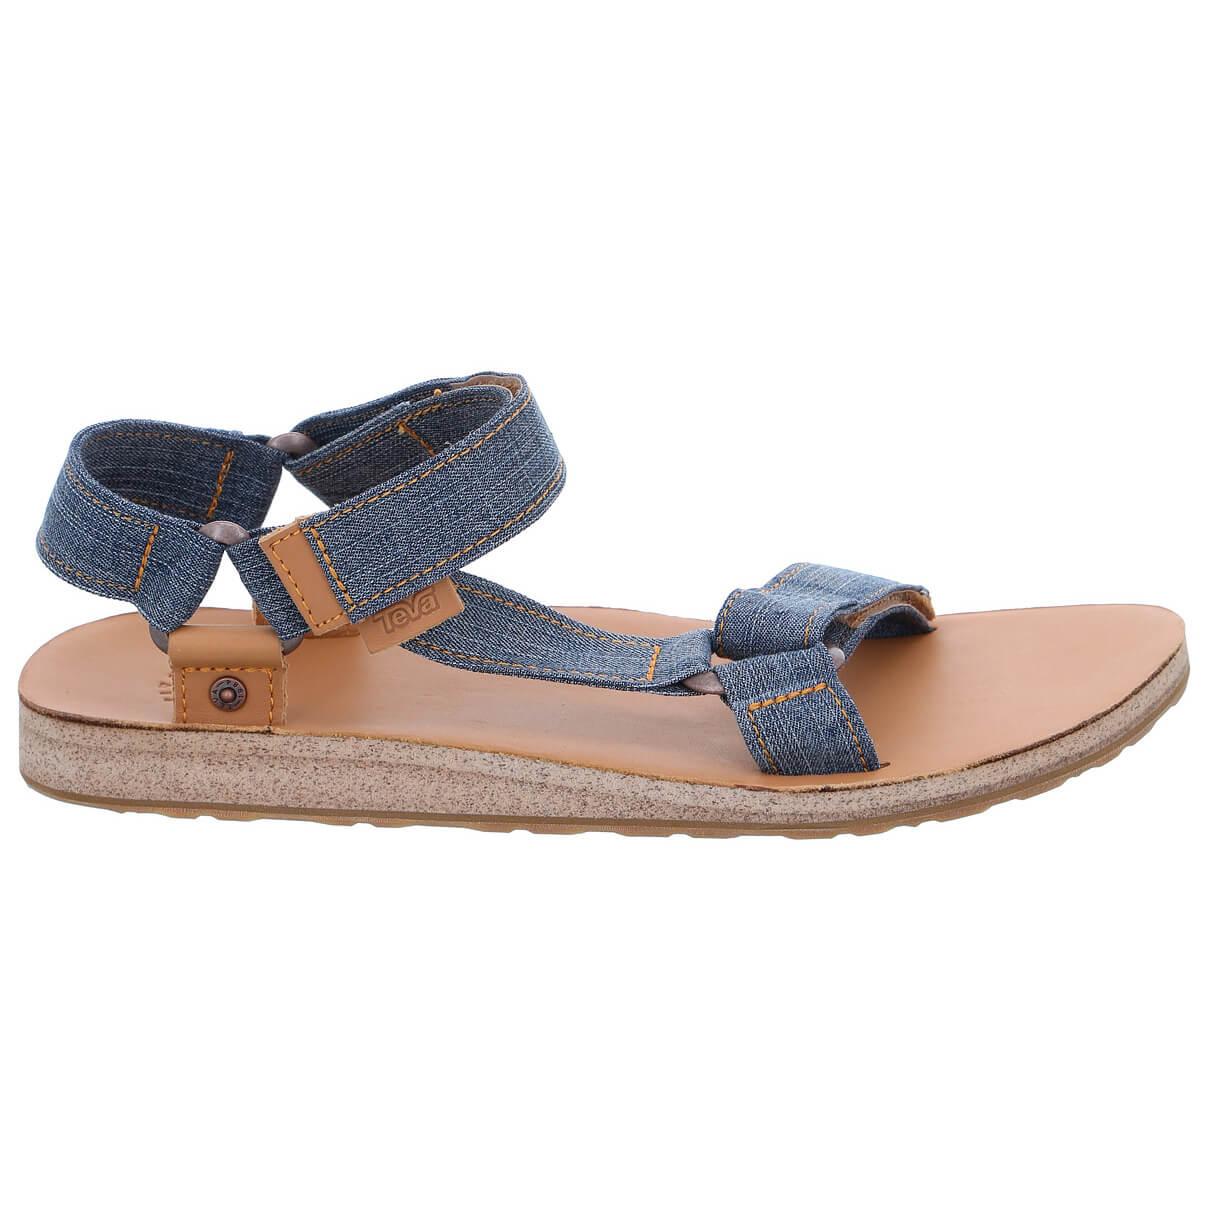 Teva Original Universal Denim Sandals Men S Buy Online